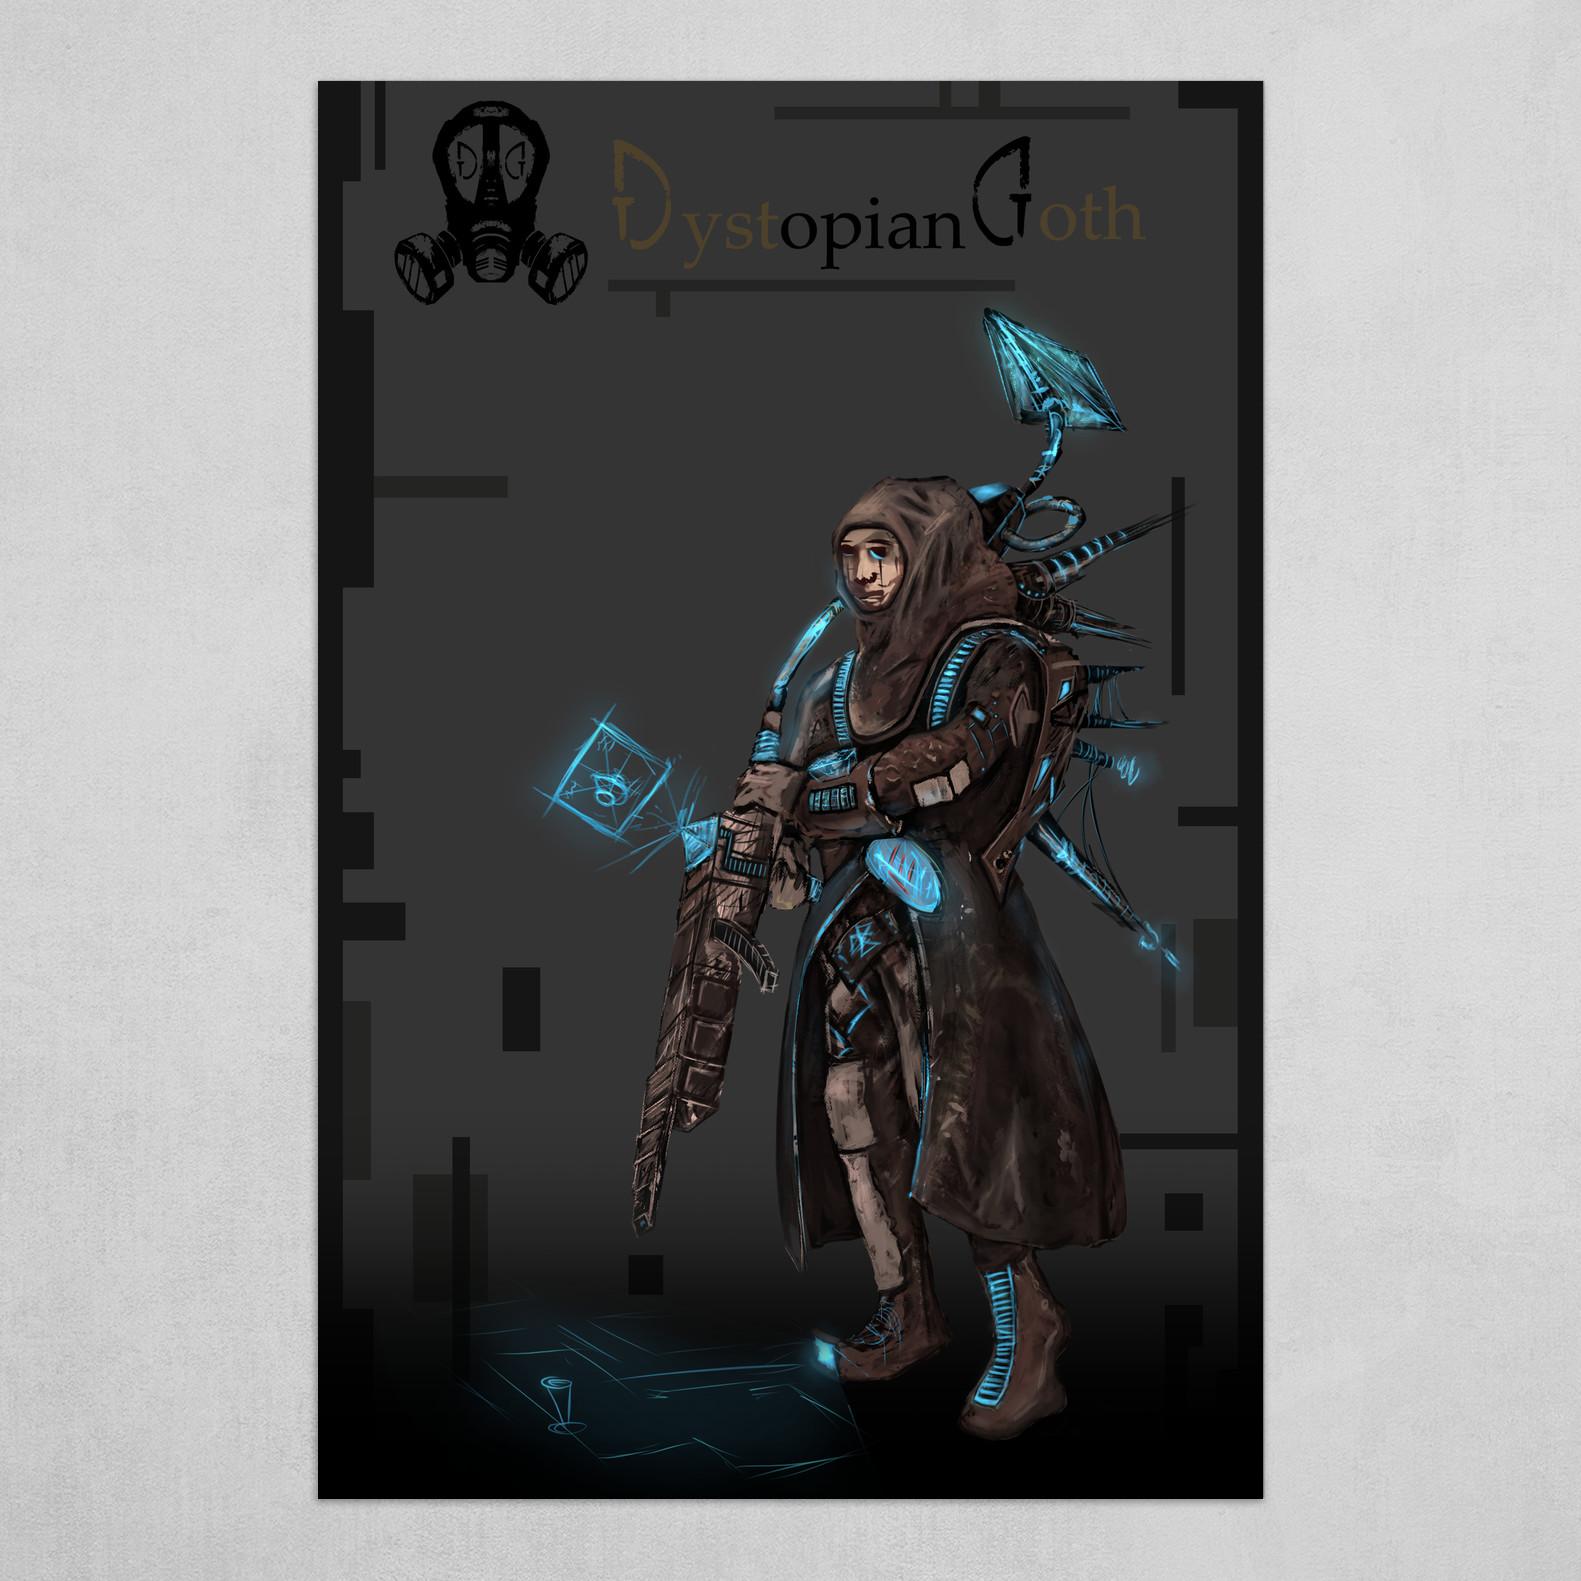 Dystopian Goth   Character_02 - Corrupt